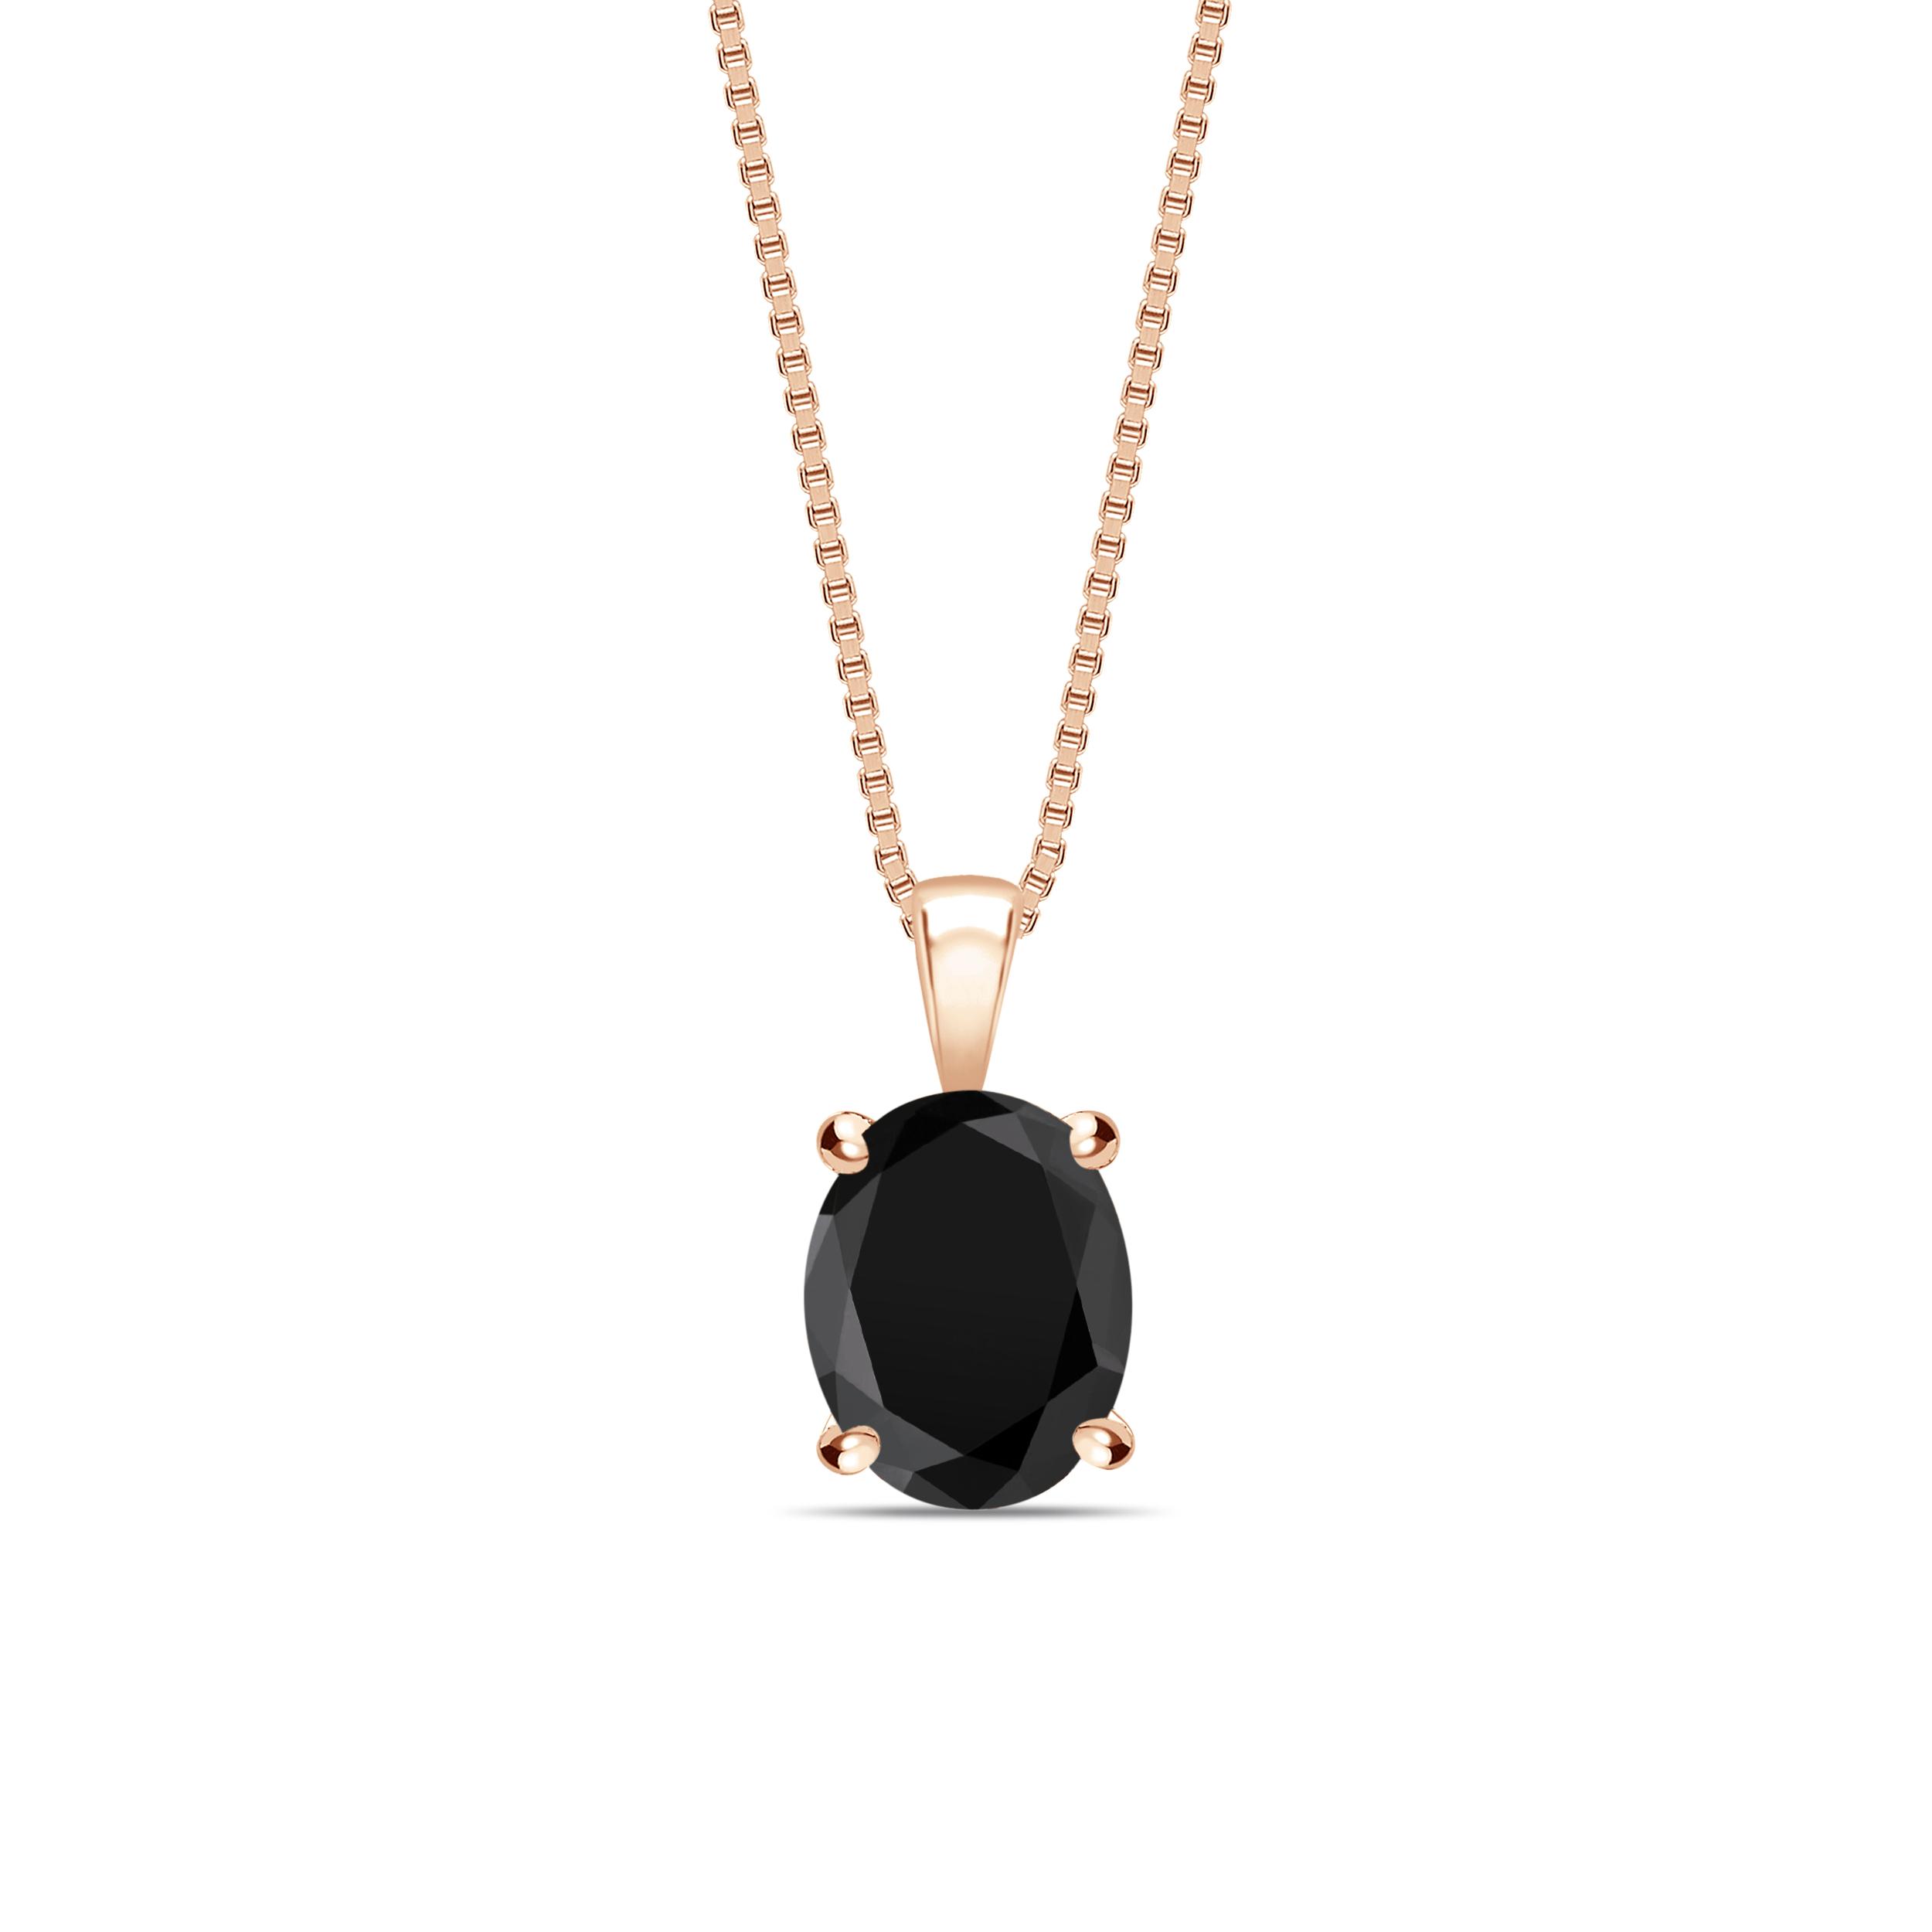 Oval Shape Popular Style Black Diamond Solitaire Pendants Necklace